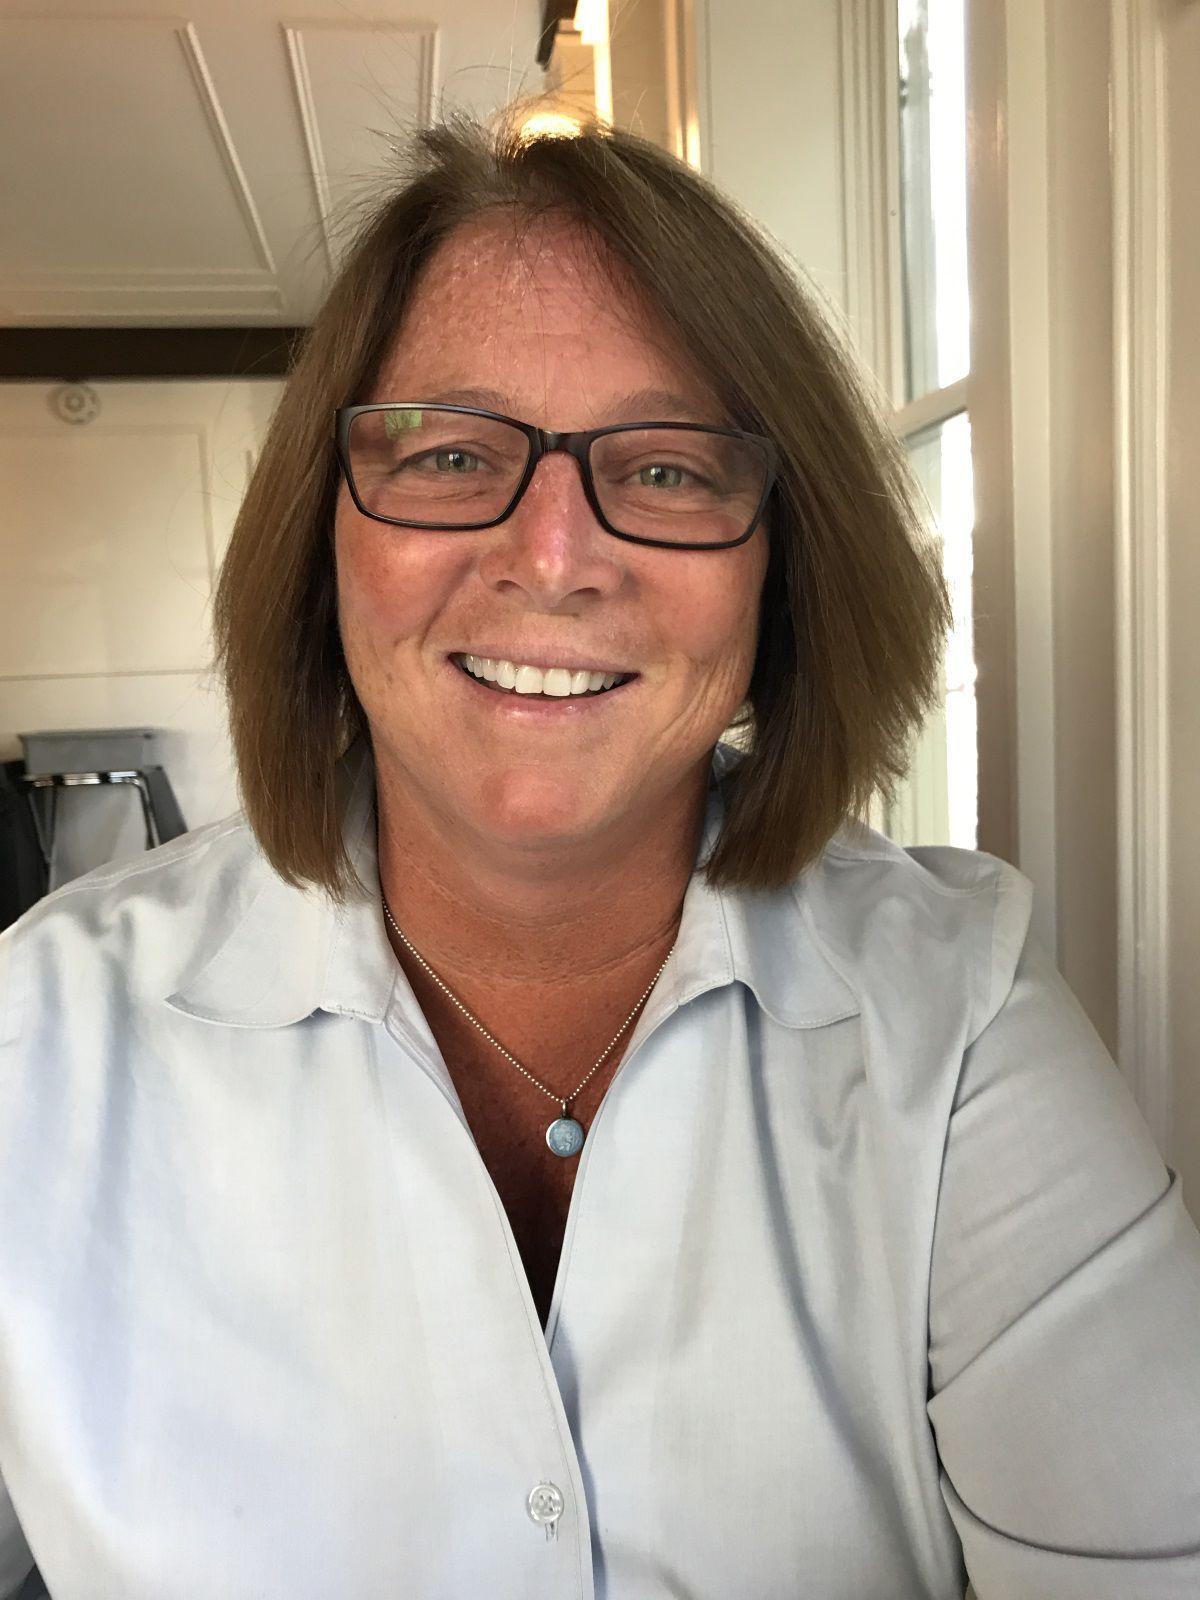 Jill Critchley Weber